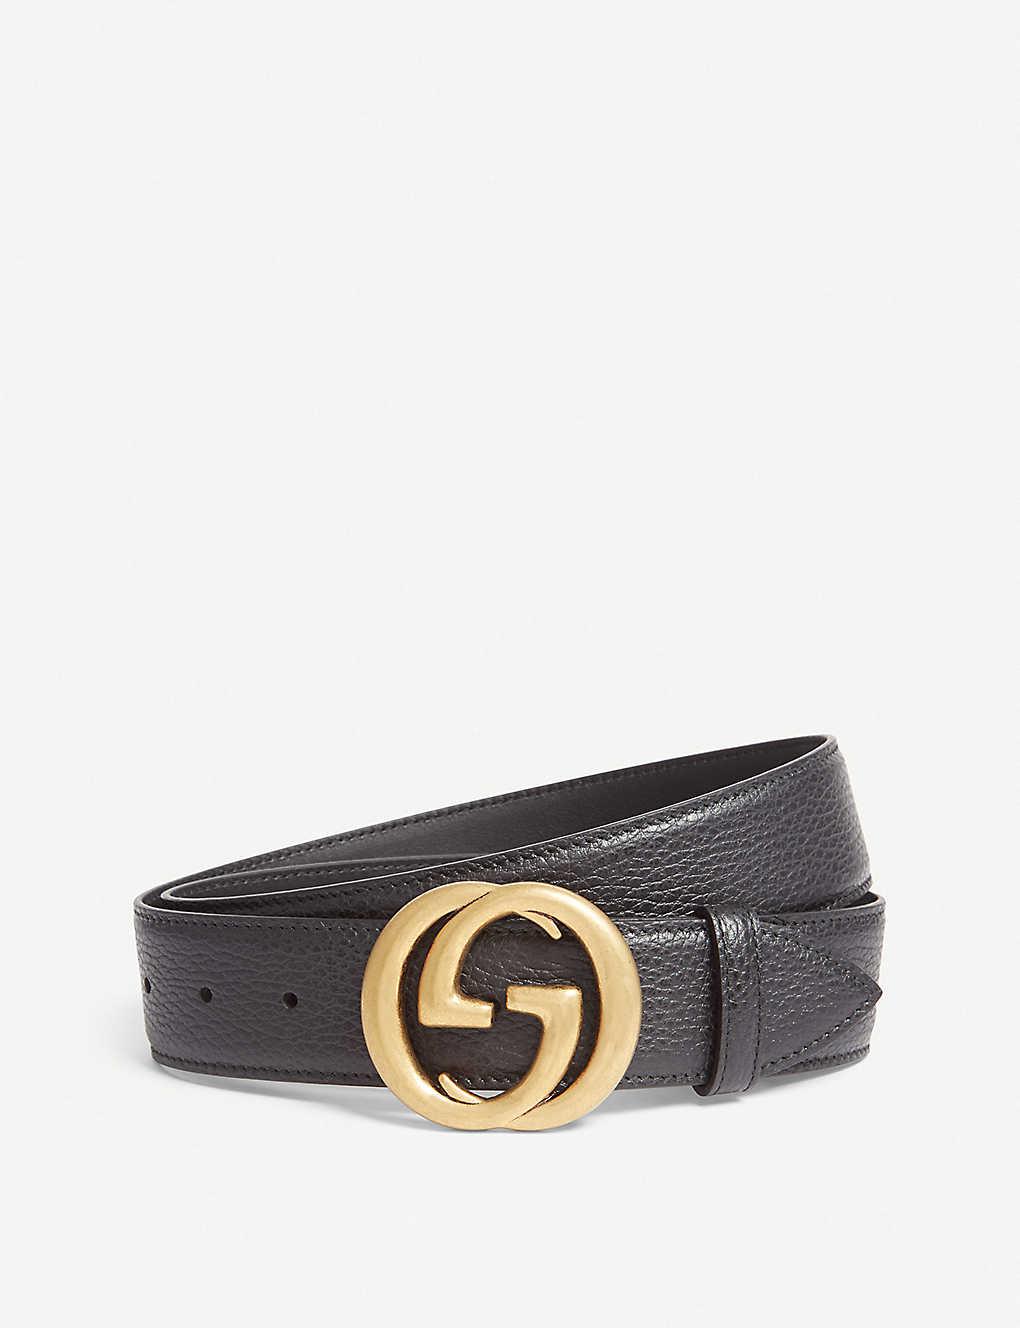 c92d1a98cdd GUCCI - Interlocking GG leather belt